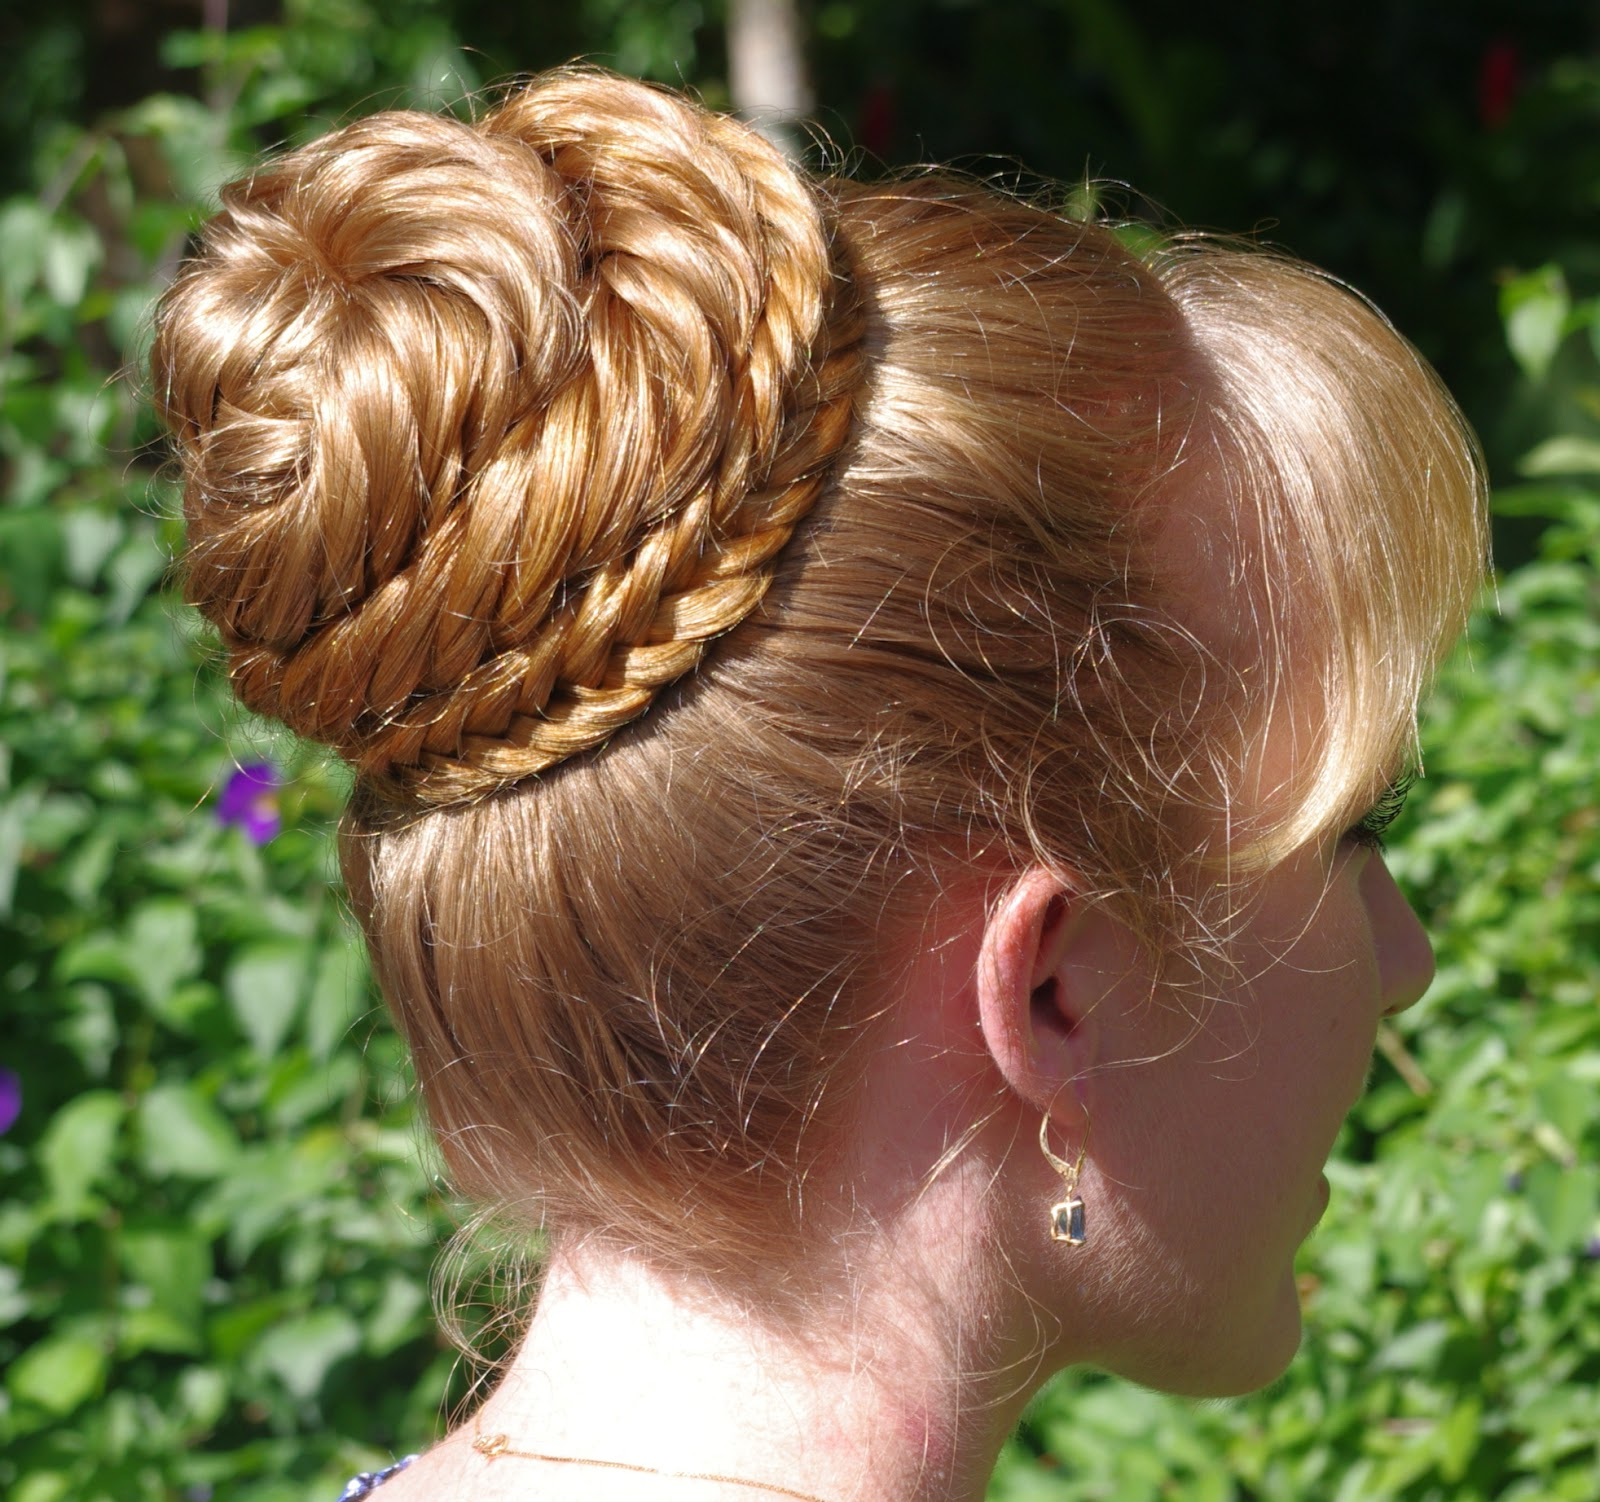 Braids & Hairstyles For Super Long Hair: Herringbone Pertaining To 2020 Cinnamon Bun Braided Hairstyles (View 7 of 20)